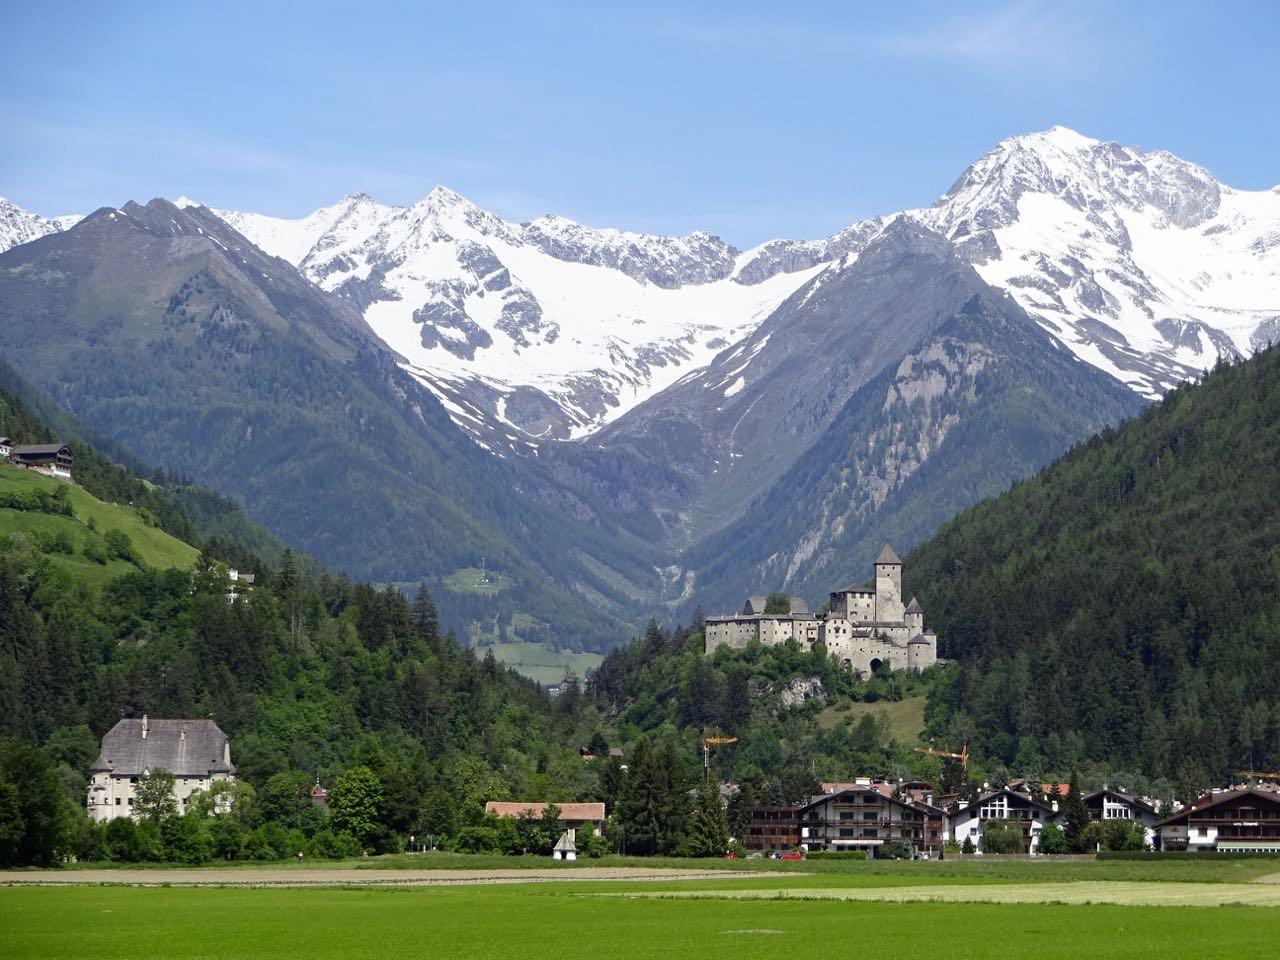 http://www.bailando-reisen.de/assets/content/reisen/Südtirol/2015-Südtirol02.jpg